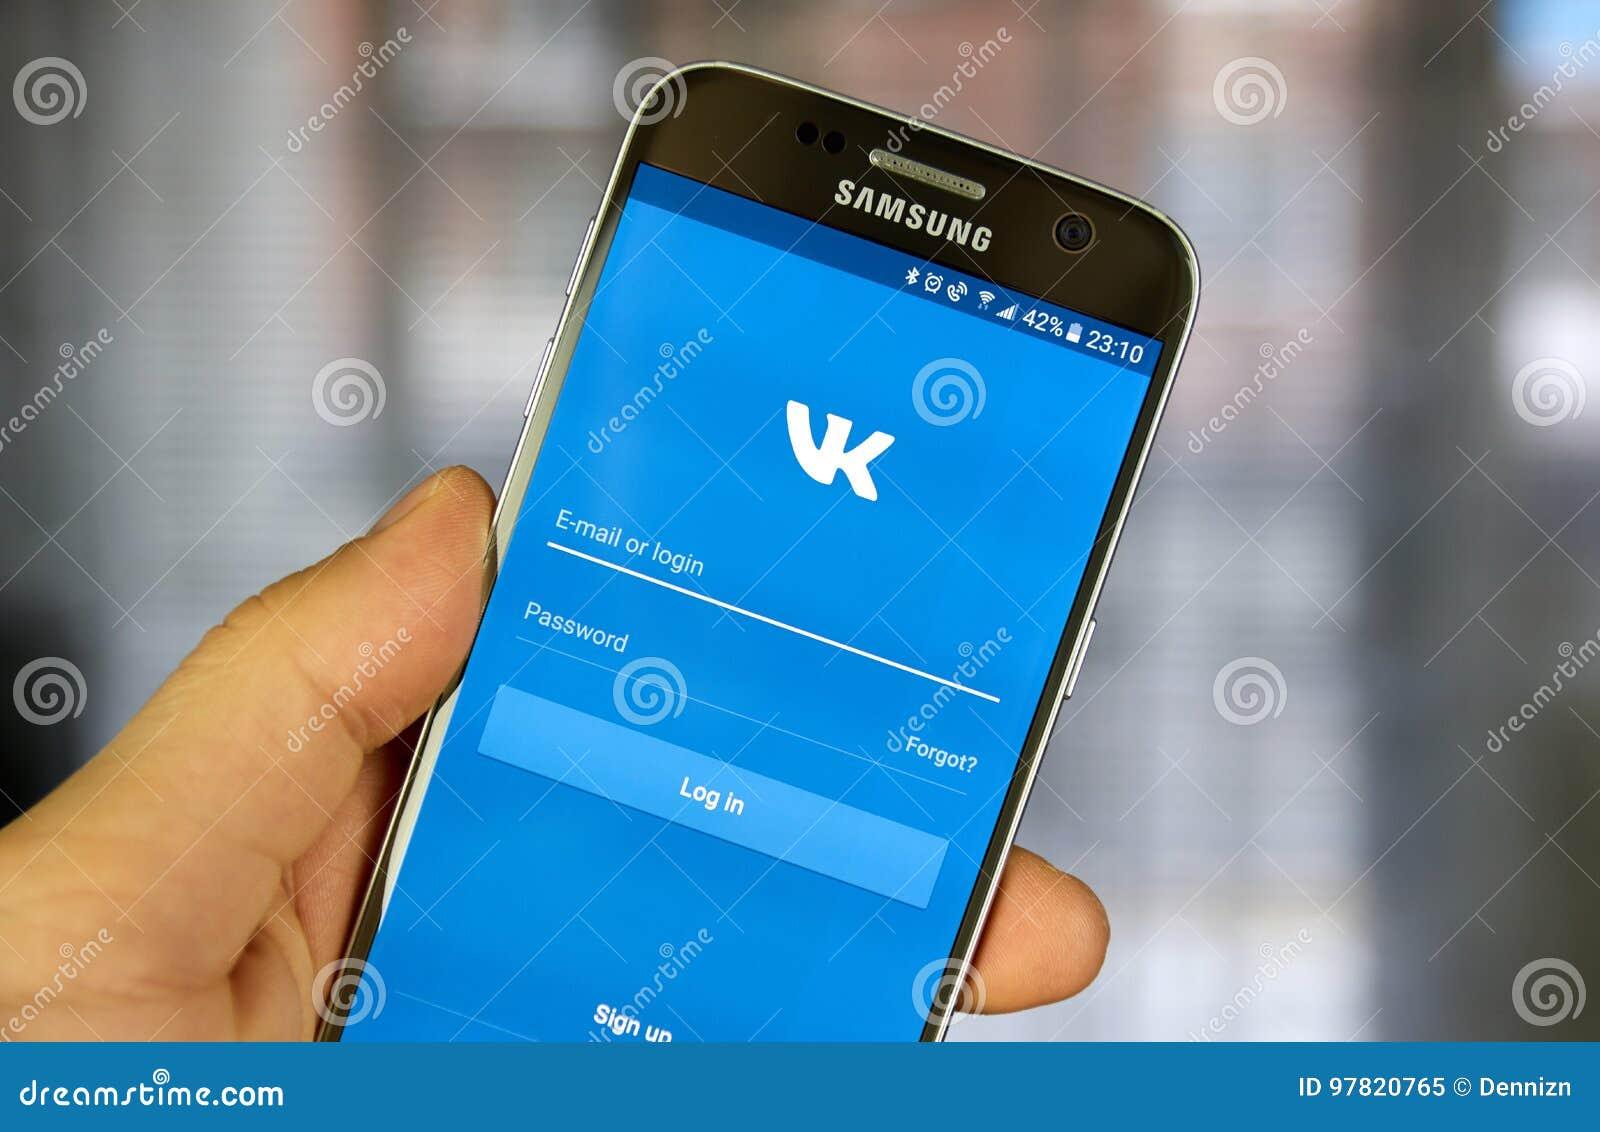 Vkontakte Application On Samsung S7 Screen Editorial Image ...